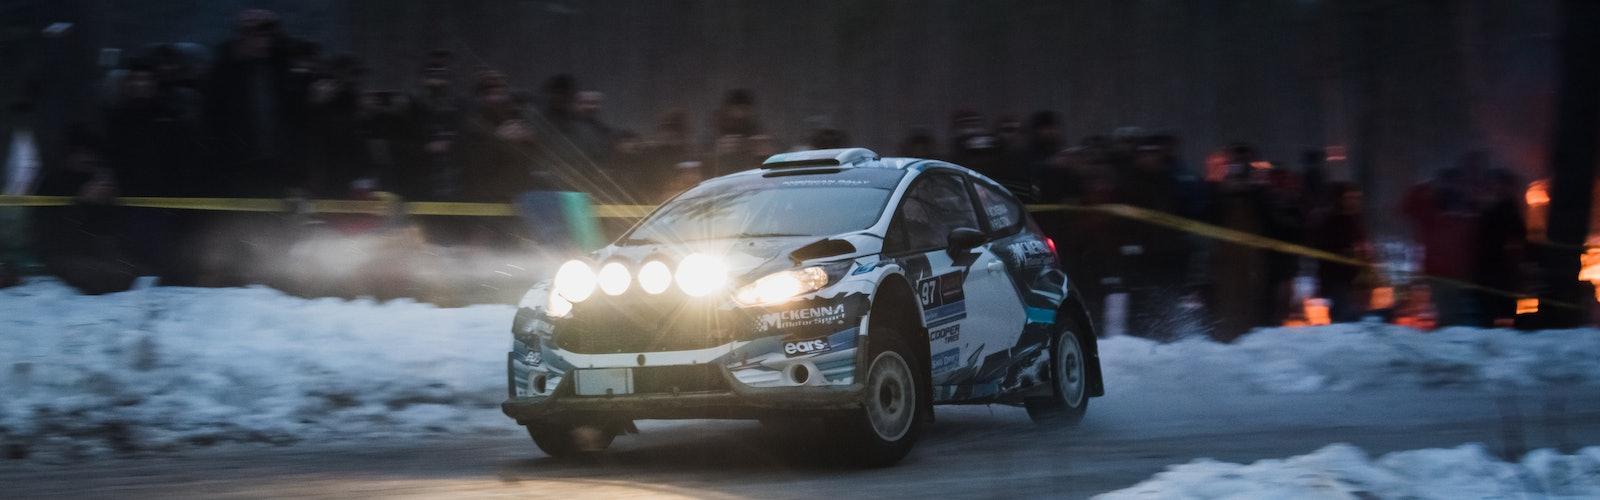 Barry McKenna Sno*Drift Rally 2020